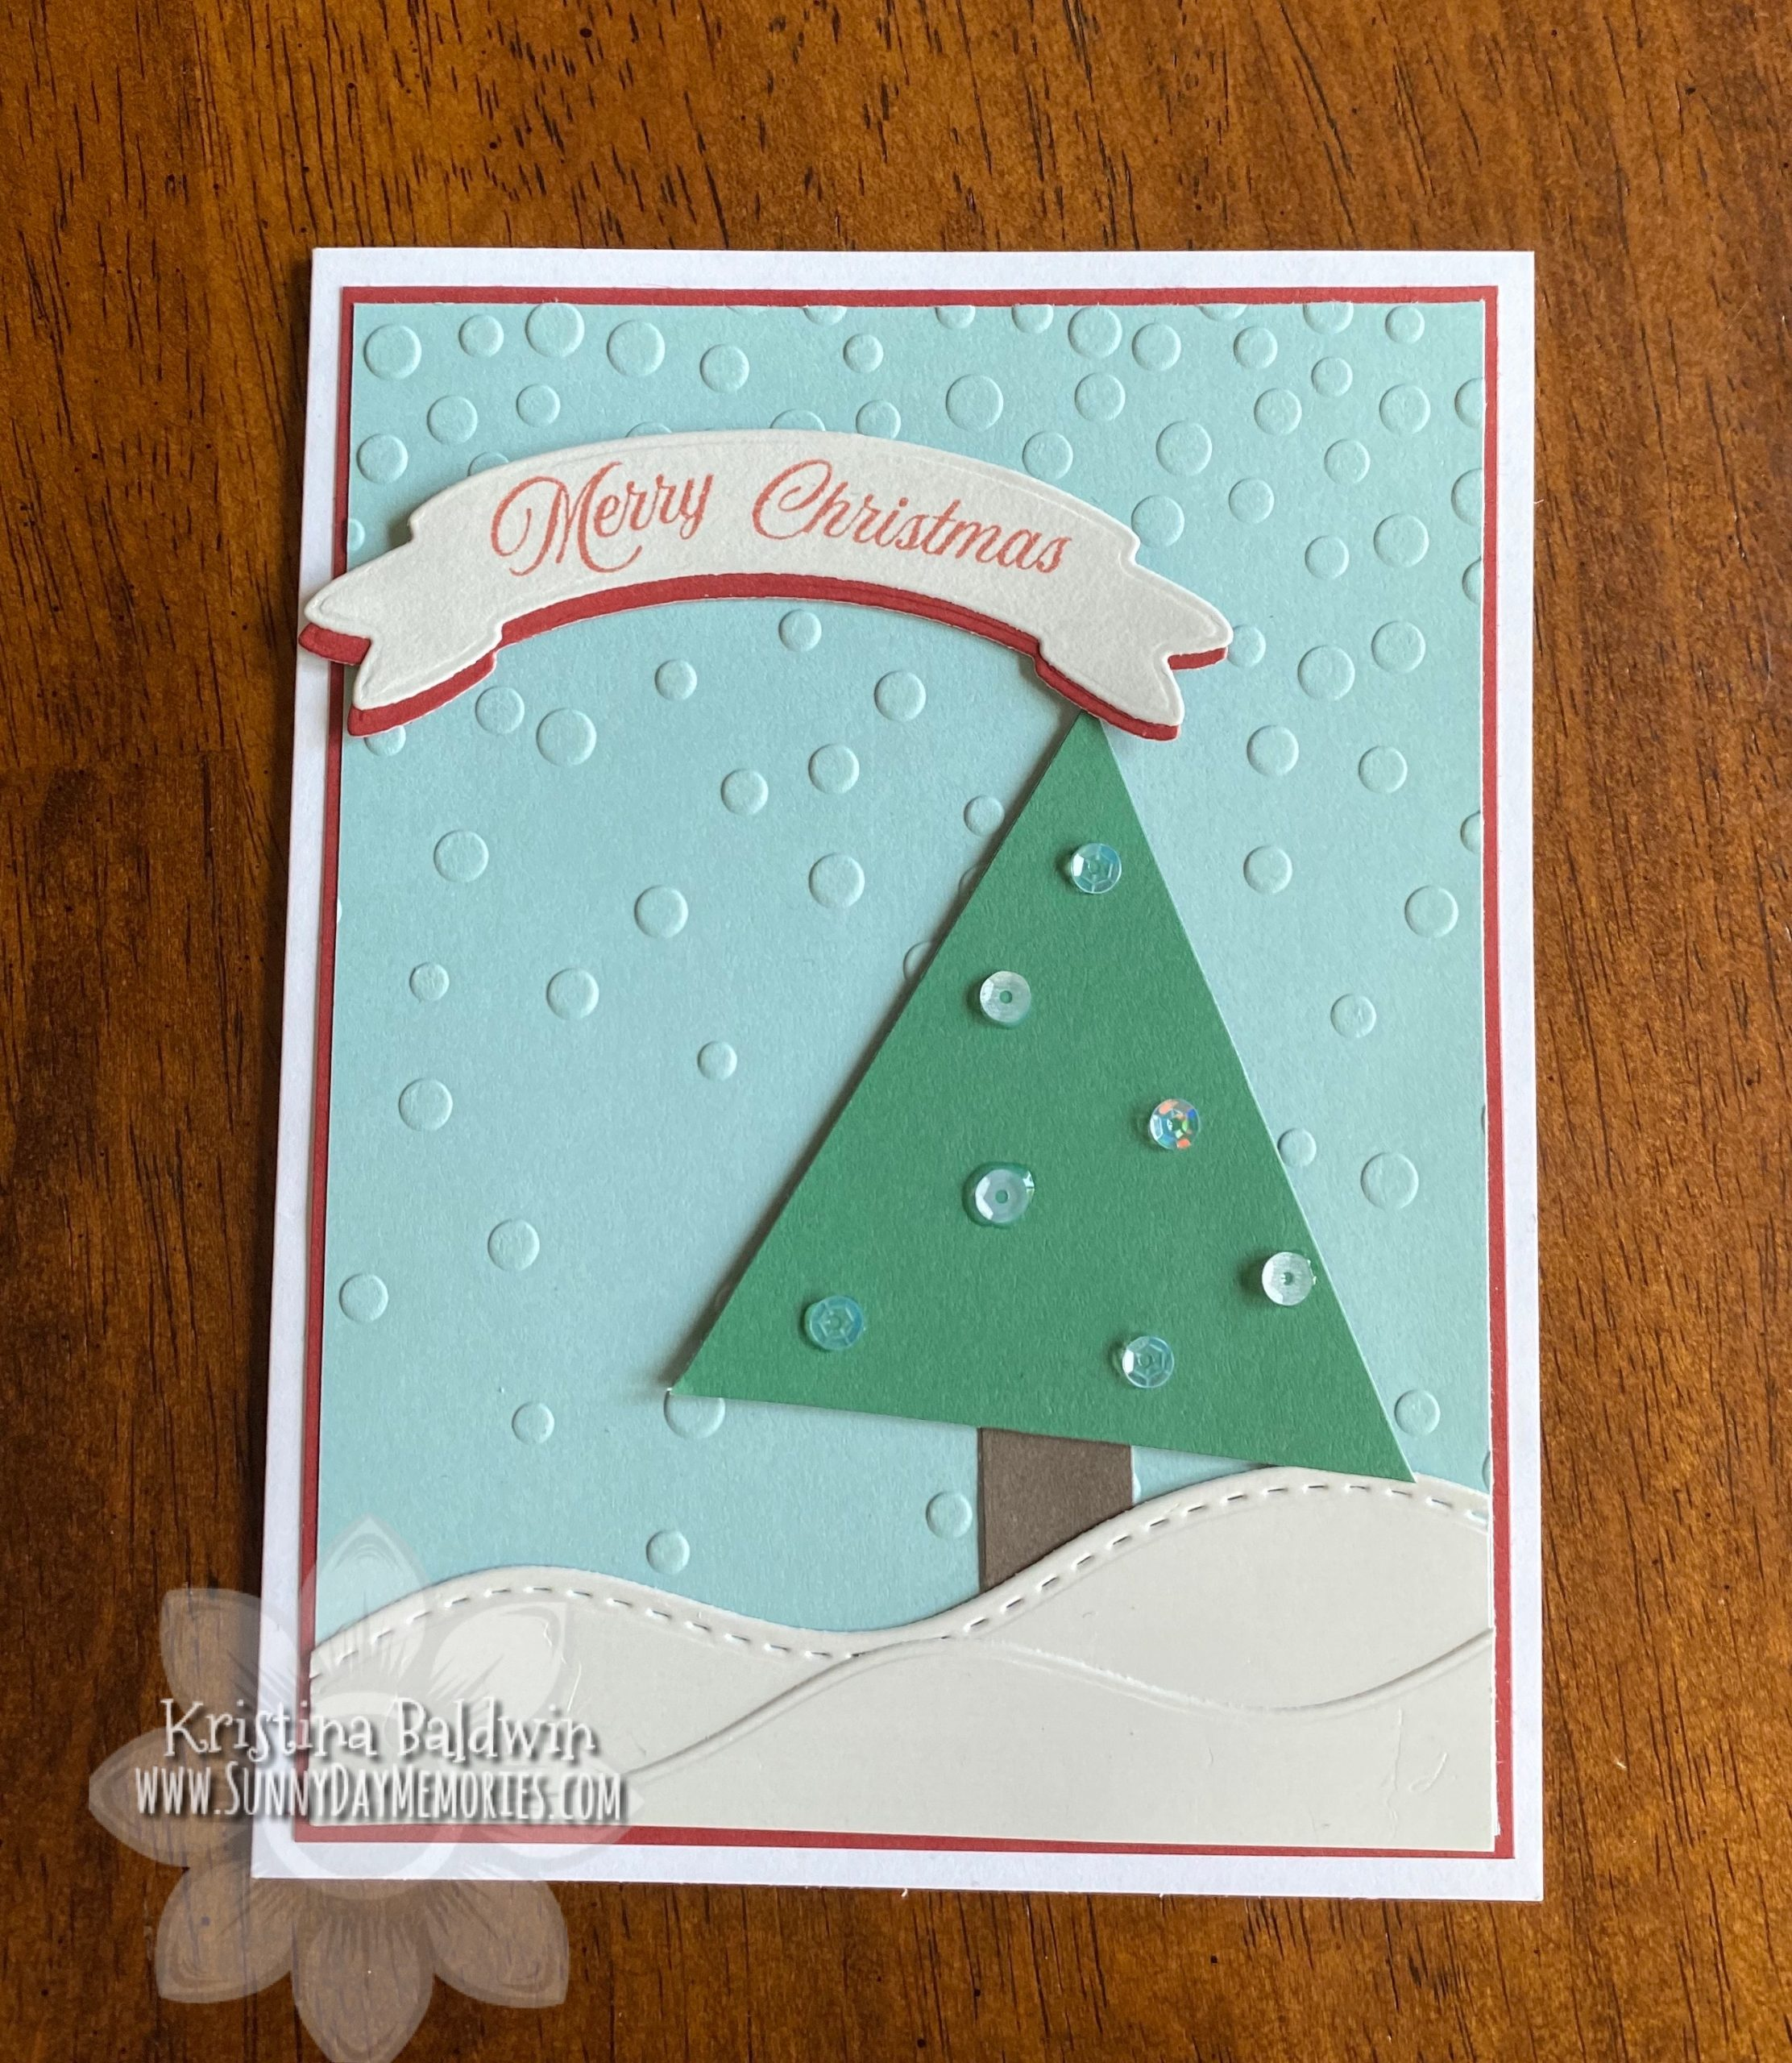 Handmade Merry Christmas Card